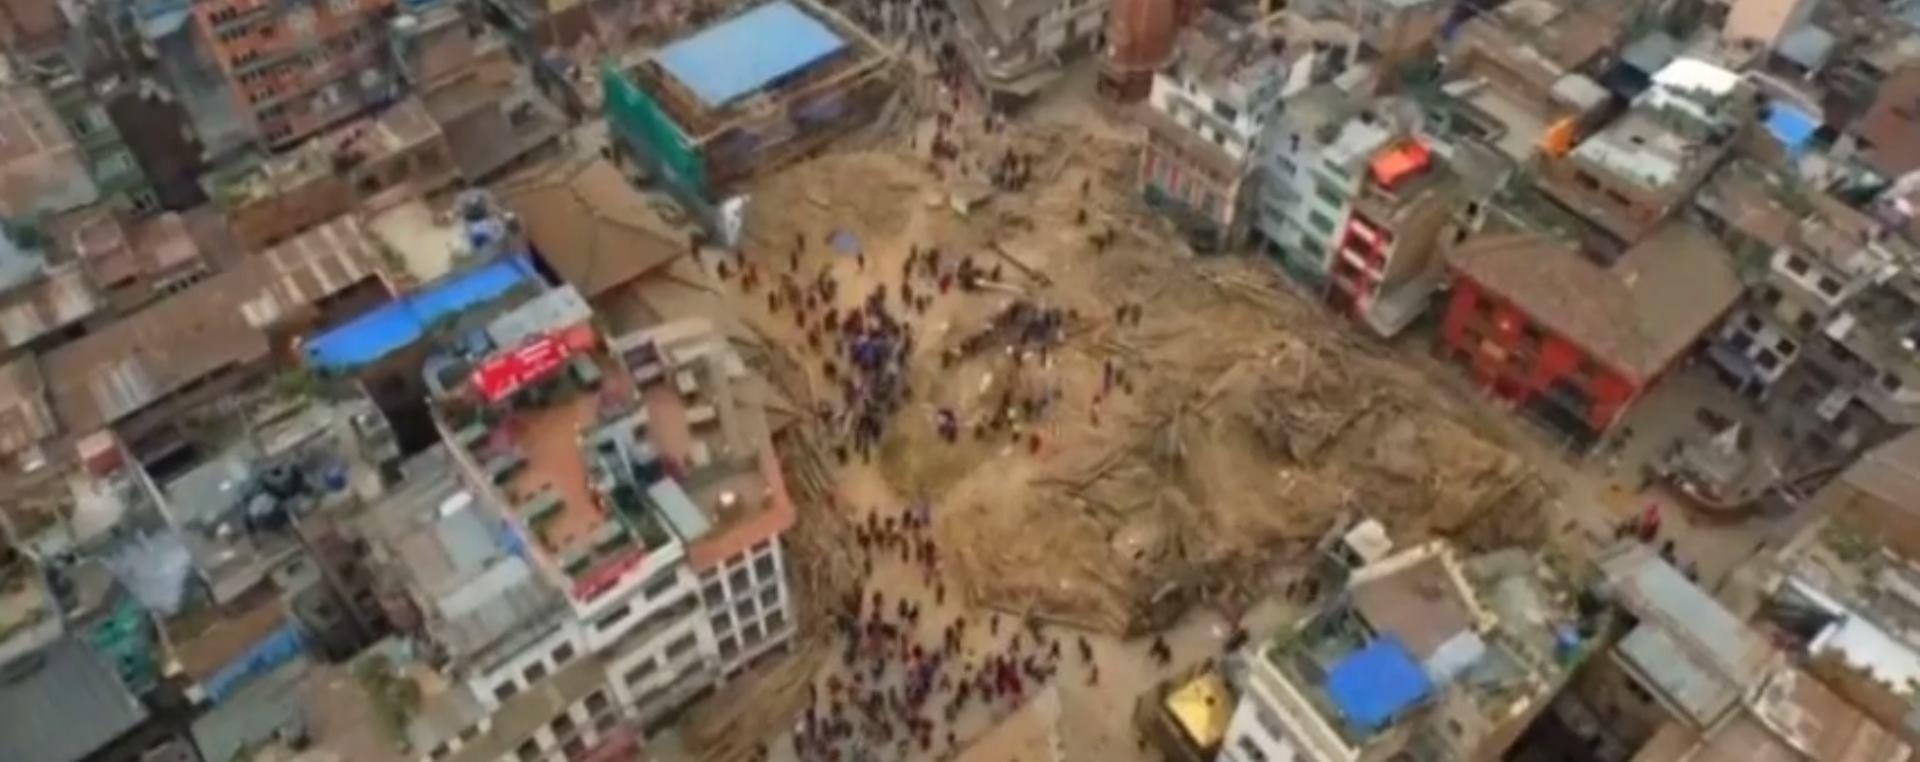 VIDEO: POTRES U NEPALU: Snimka Katmandua u trenutku potresa